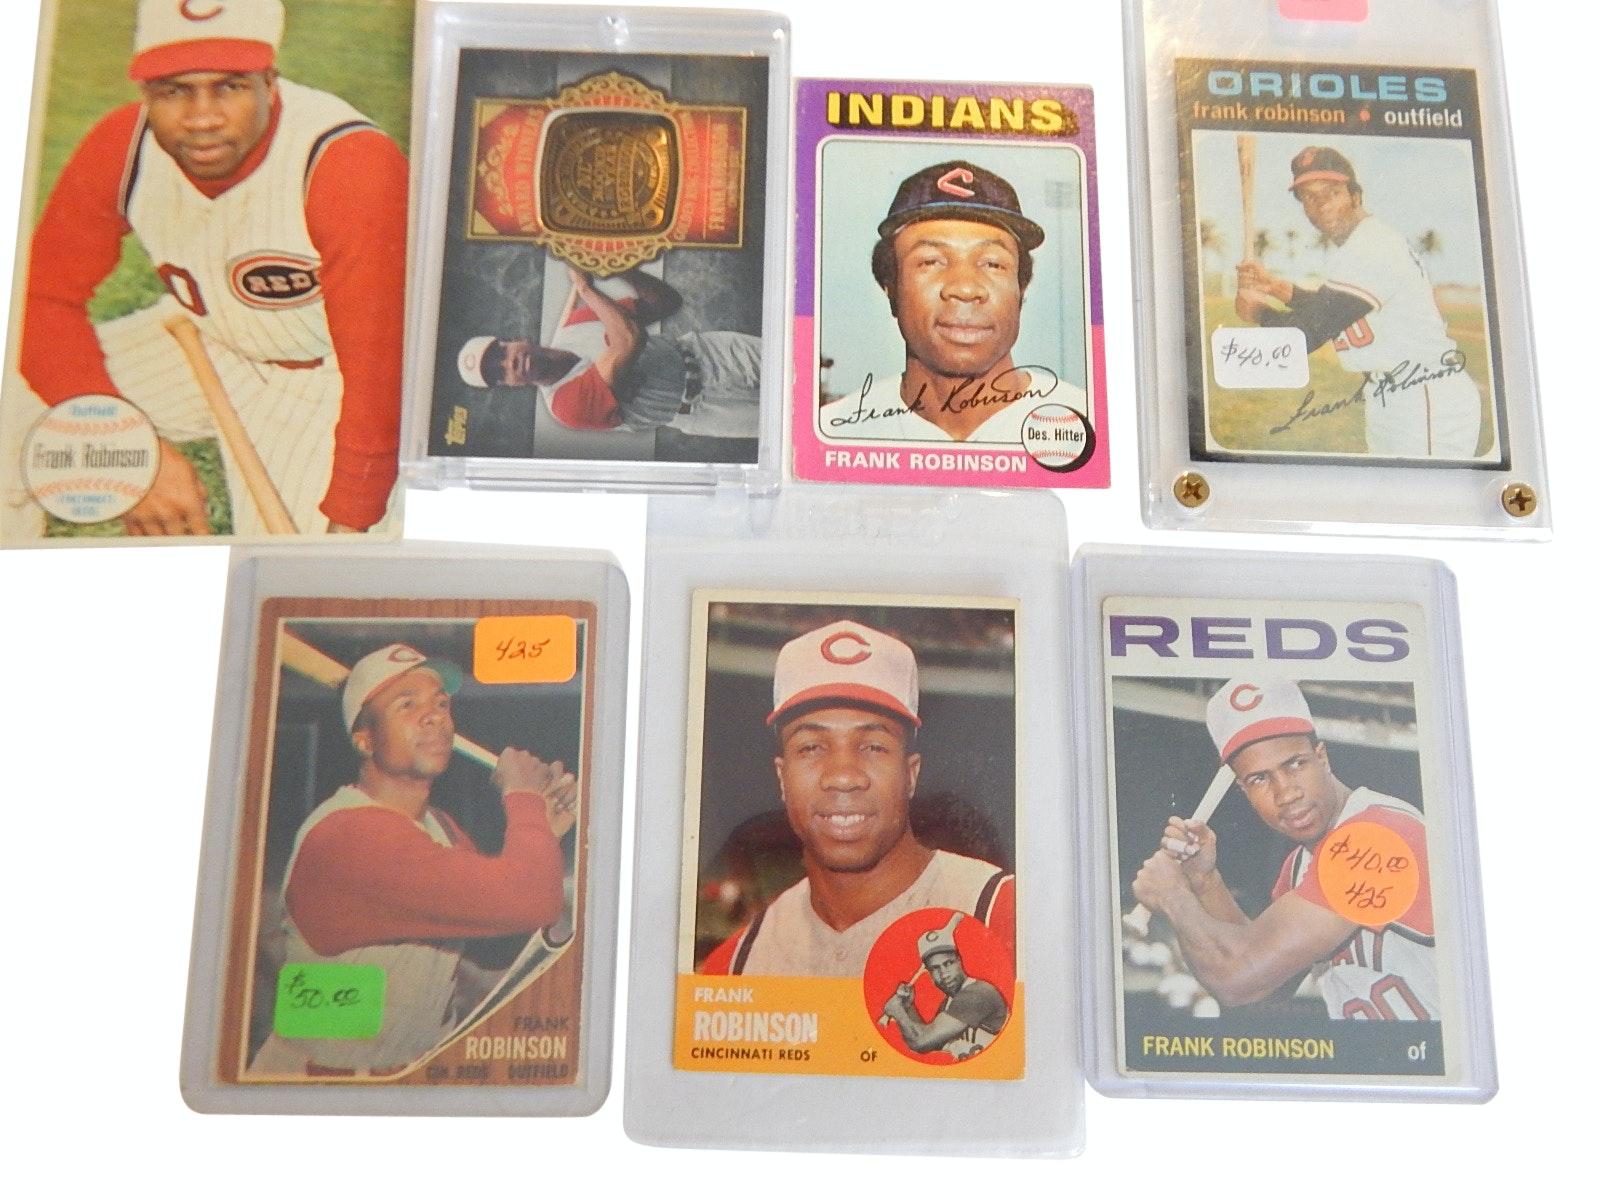 Frank Robinson Baseball Card Lot from 1962 to 2012